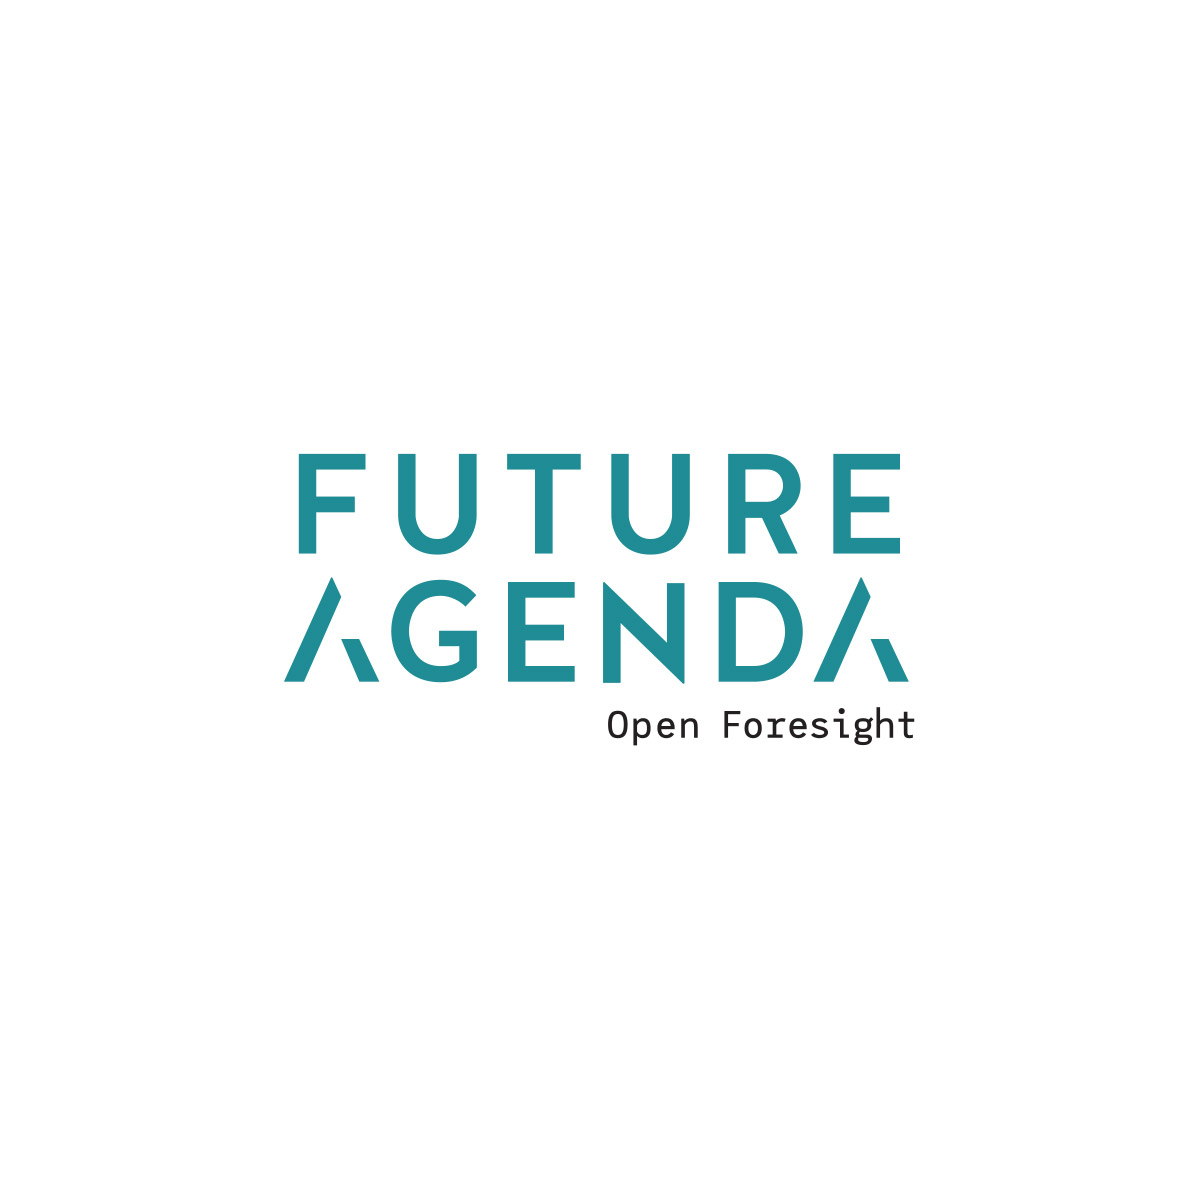 The Future of Work and Skills Development - Future Agenda